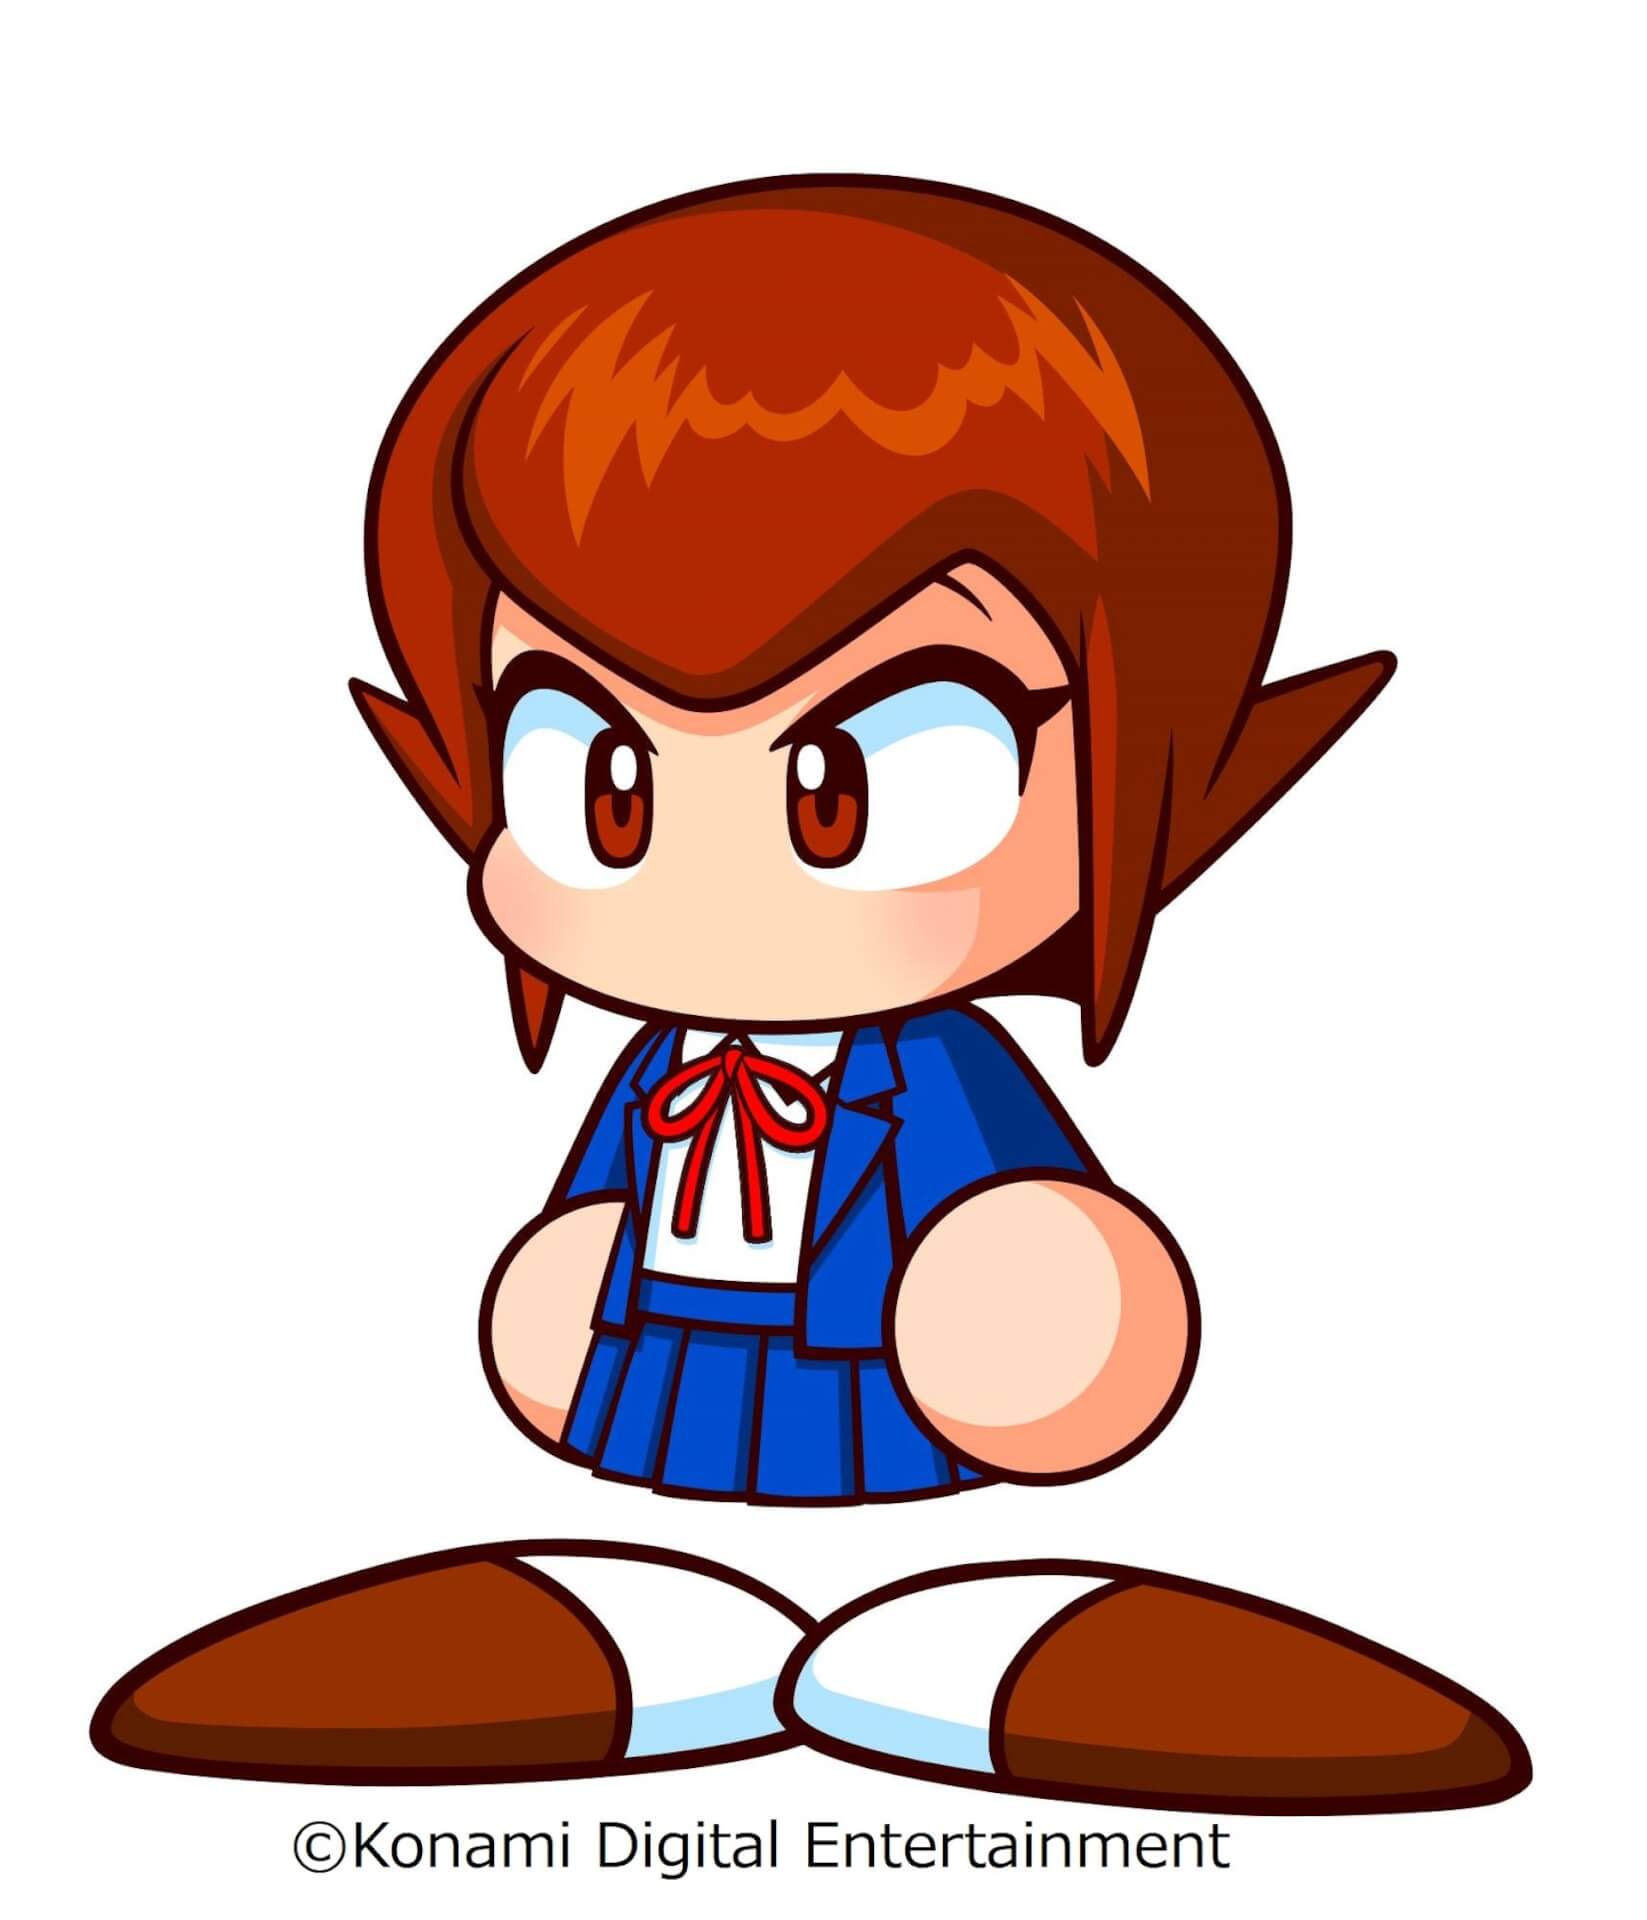 Nintendo Switch『パワプロクンポケットR』の発売日が11月25日に決定!DLCパワポケダッシュも早期購入特典に tech210805_pawapoker_5